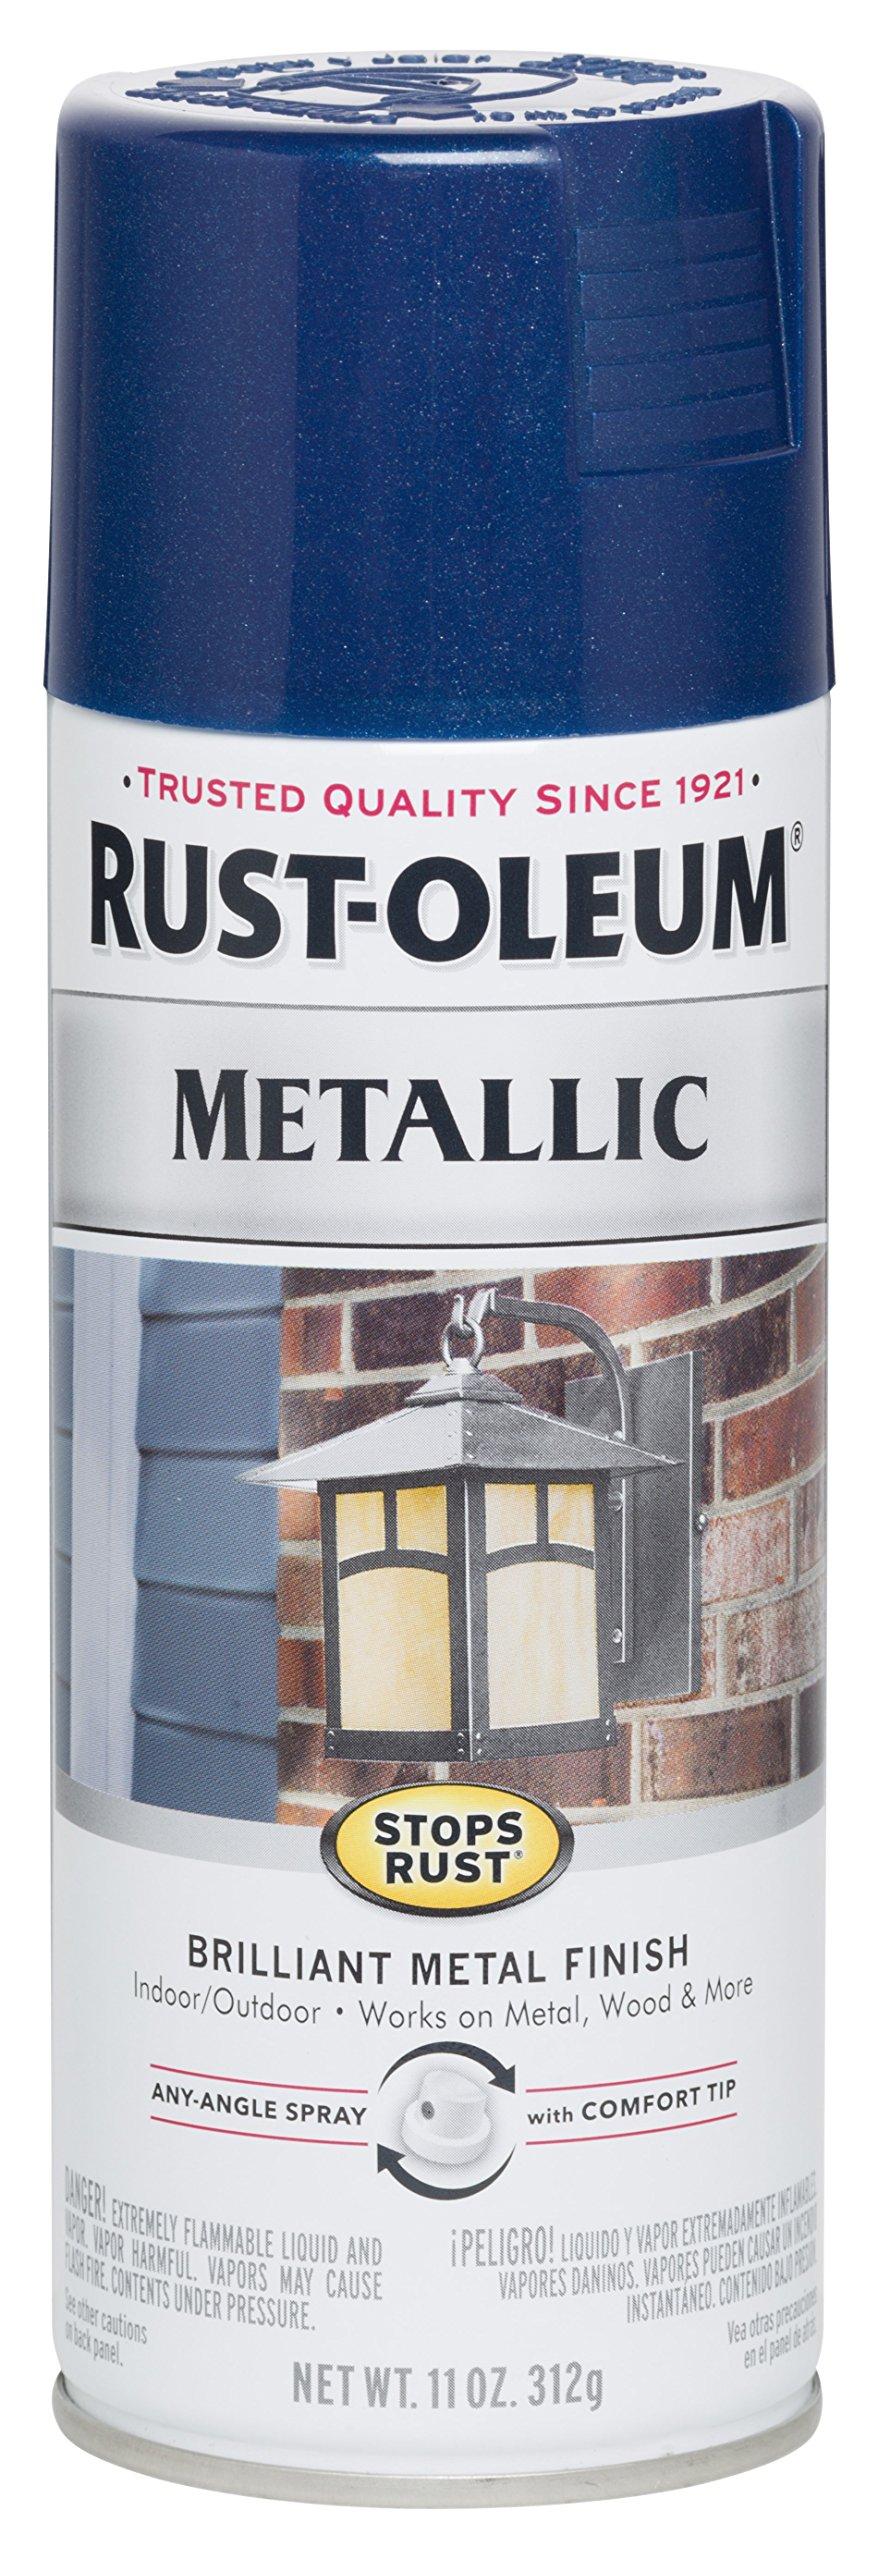 Rust-Oleum 7251830 Stops Rust Metallic Spray Paint, 11 oz, Cobalt Blue